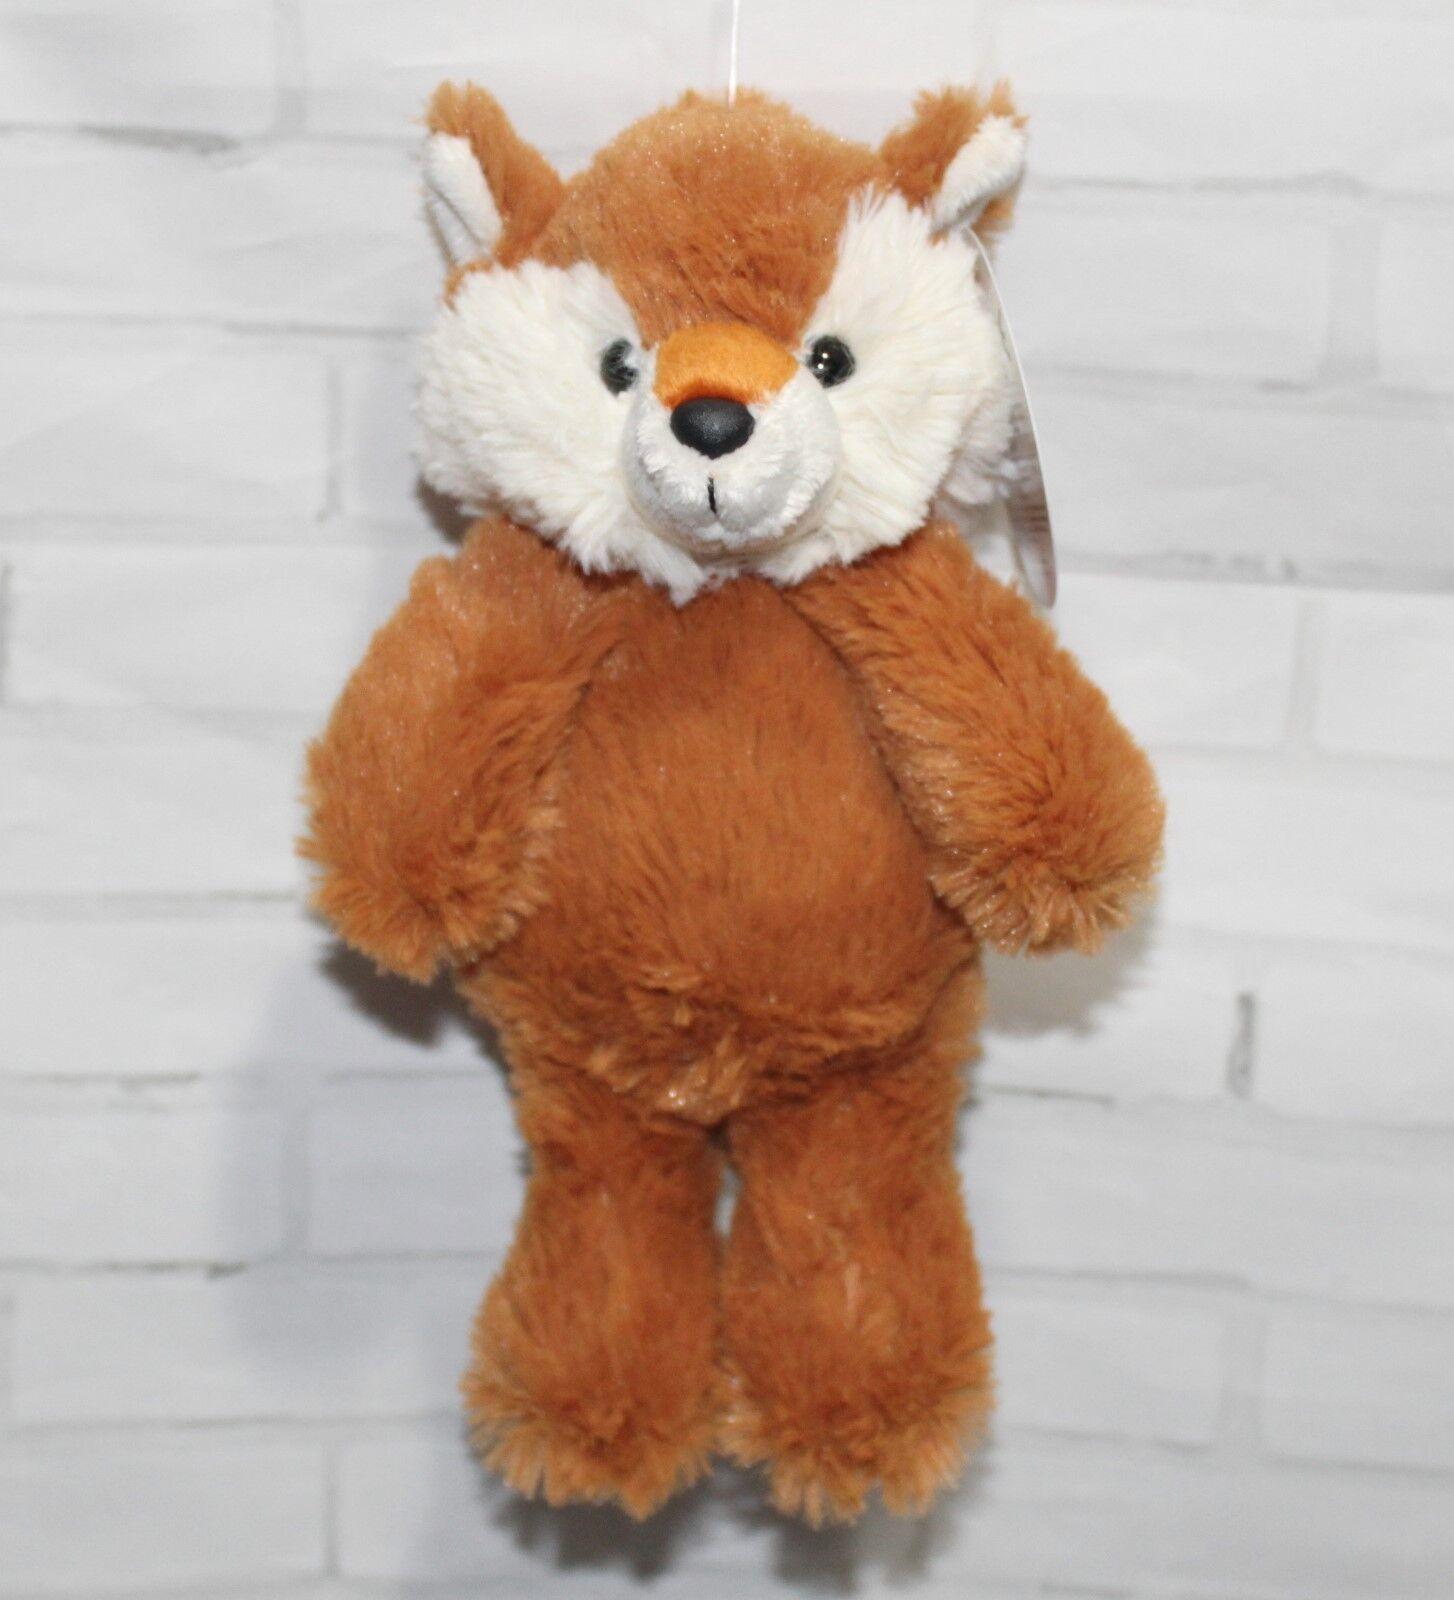 "Aurora Cuddly Friends FOX 8"" Plush Floppy Stuffed Animal NEW"